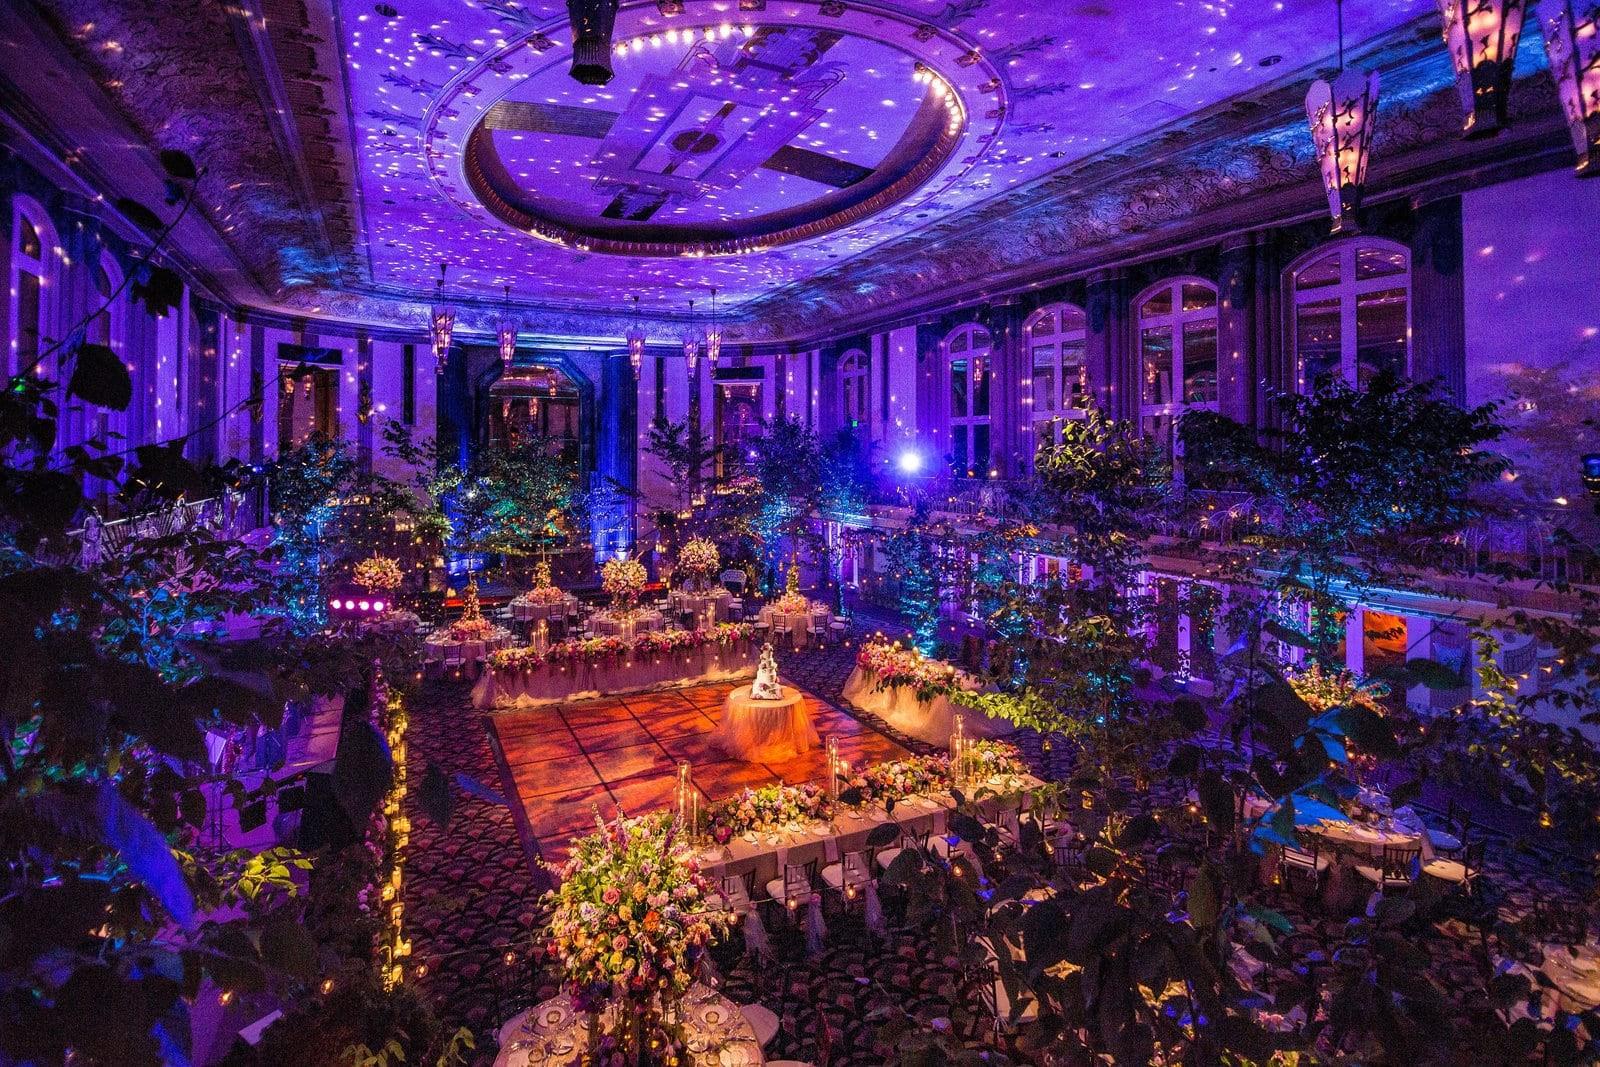 Wedding Venues In Columbus Ohio  18 of the Best Wedding Venues in Columbus Ohio